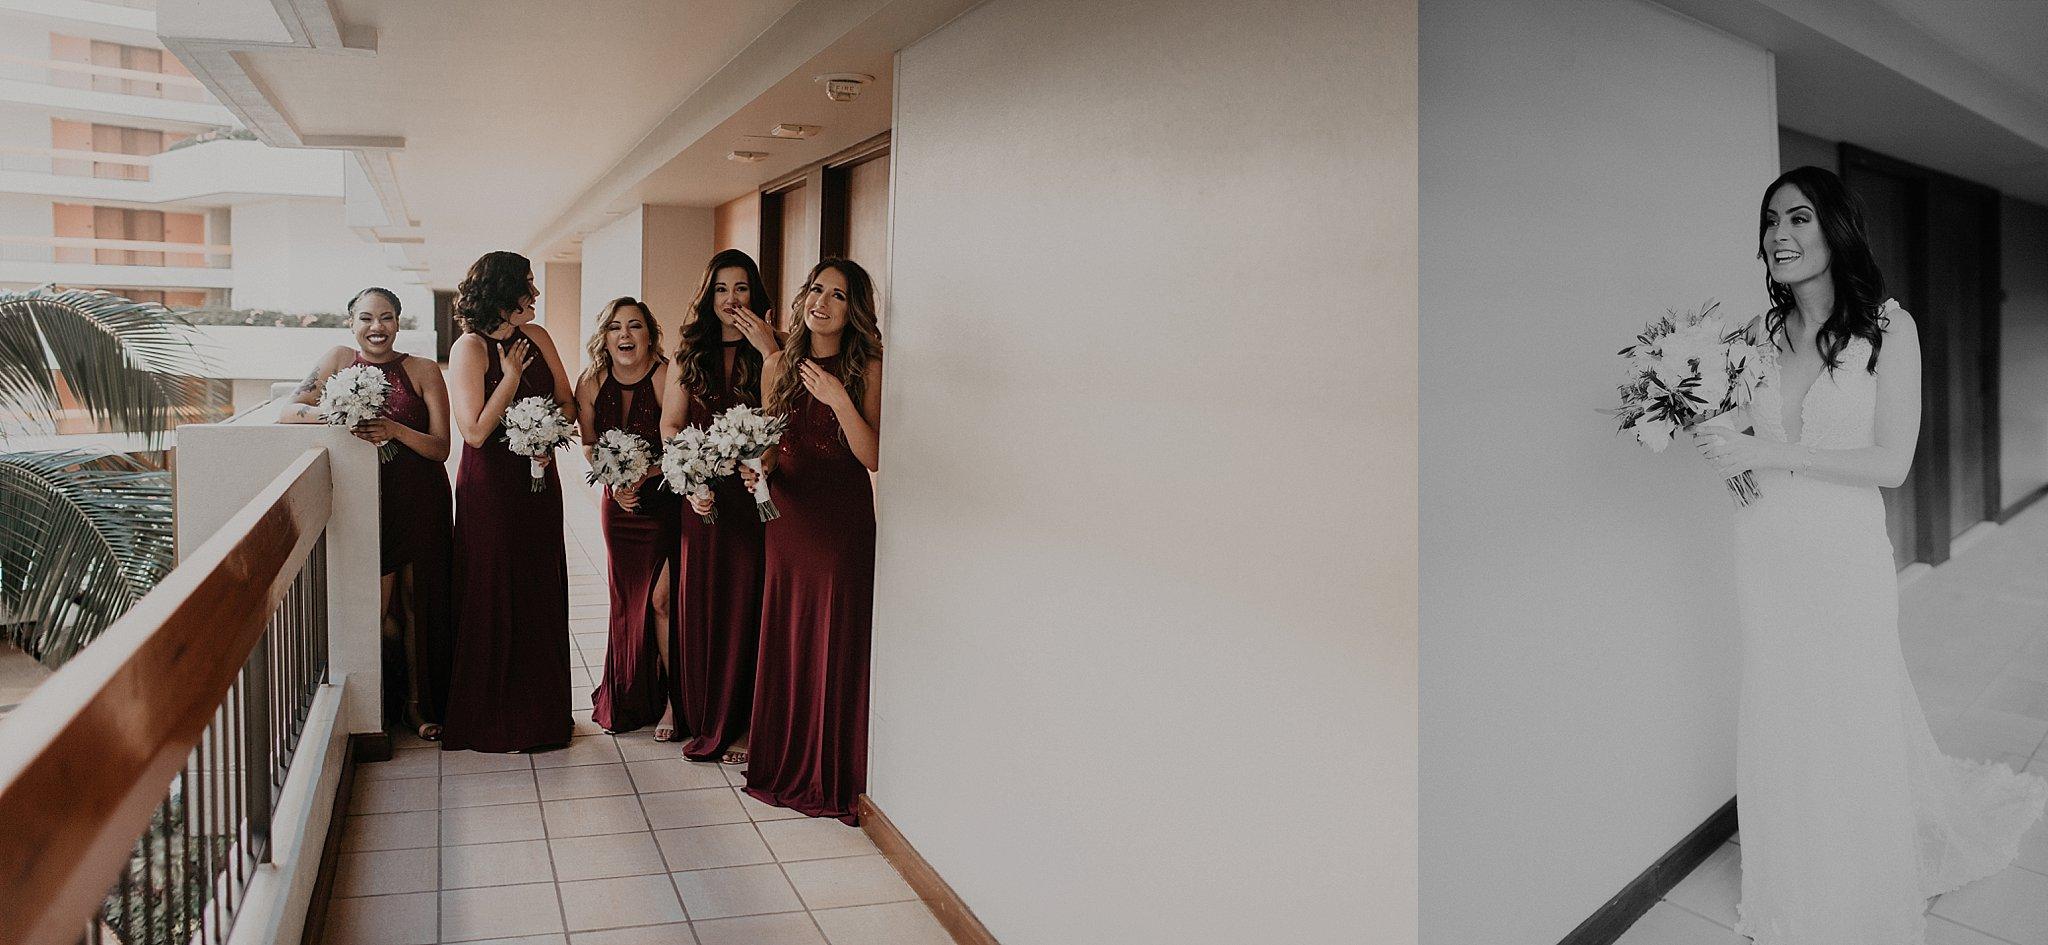 samantha_mcfarlen_bellingham_washington_engagement_photography_seattle_wedding_photographer_0186.jpg